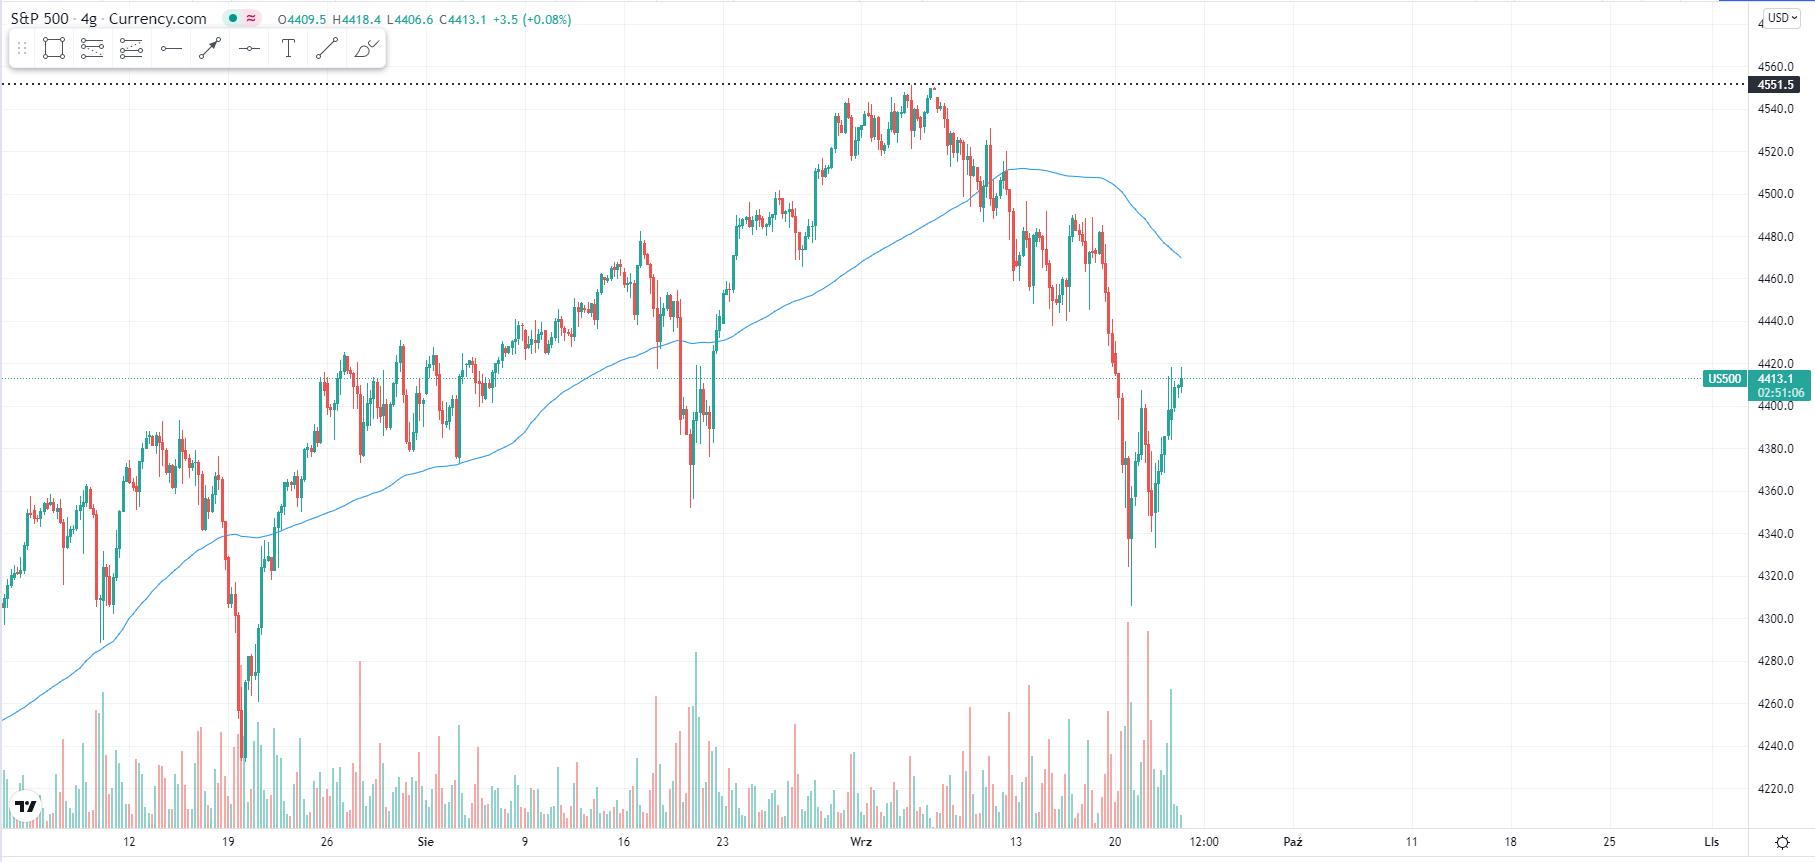 wykres Kurs S&P500 H4 23.09.2021